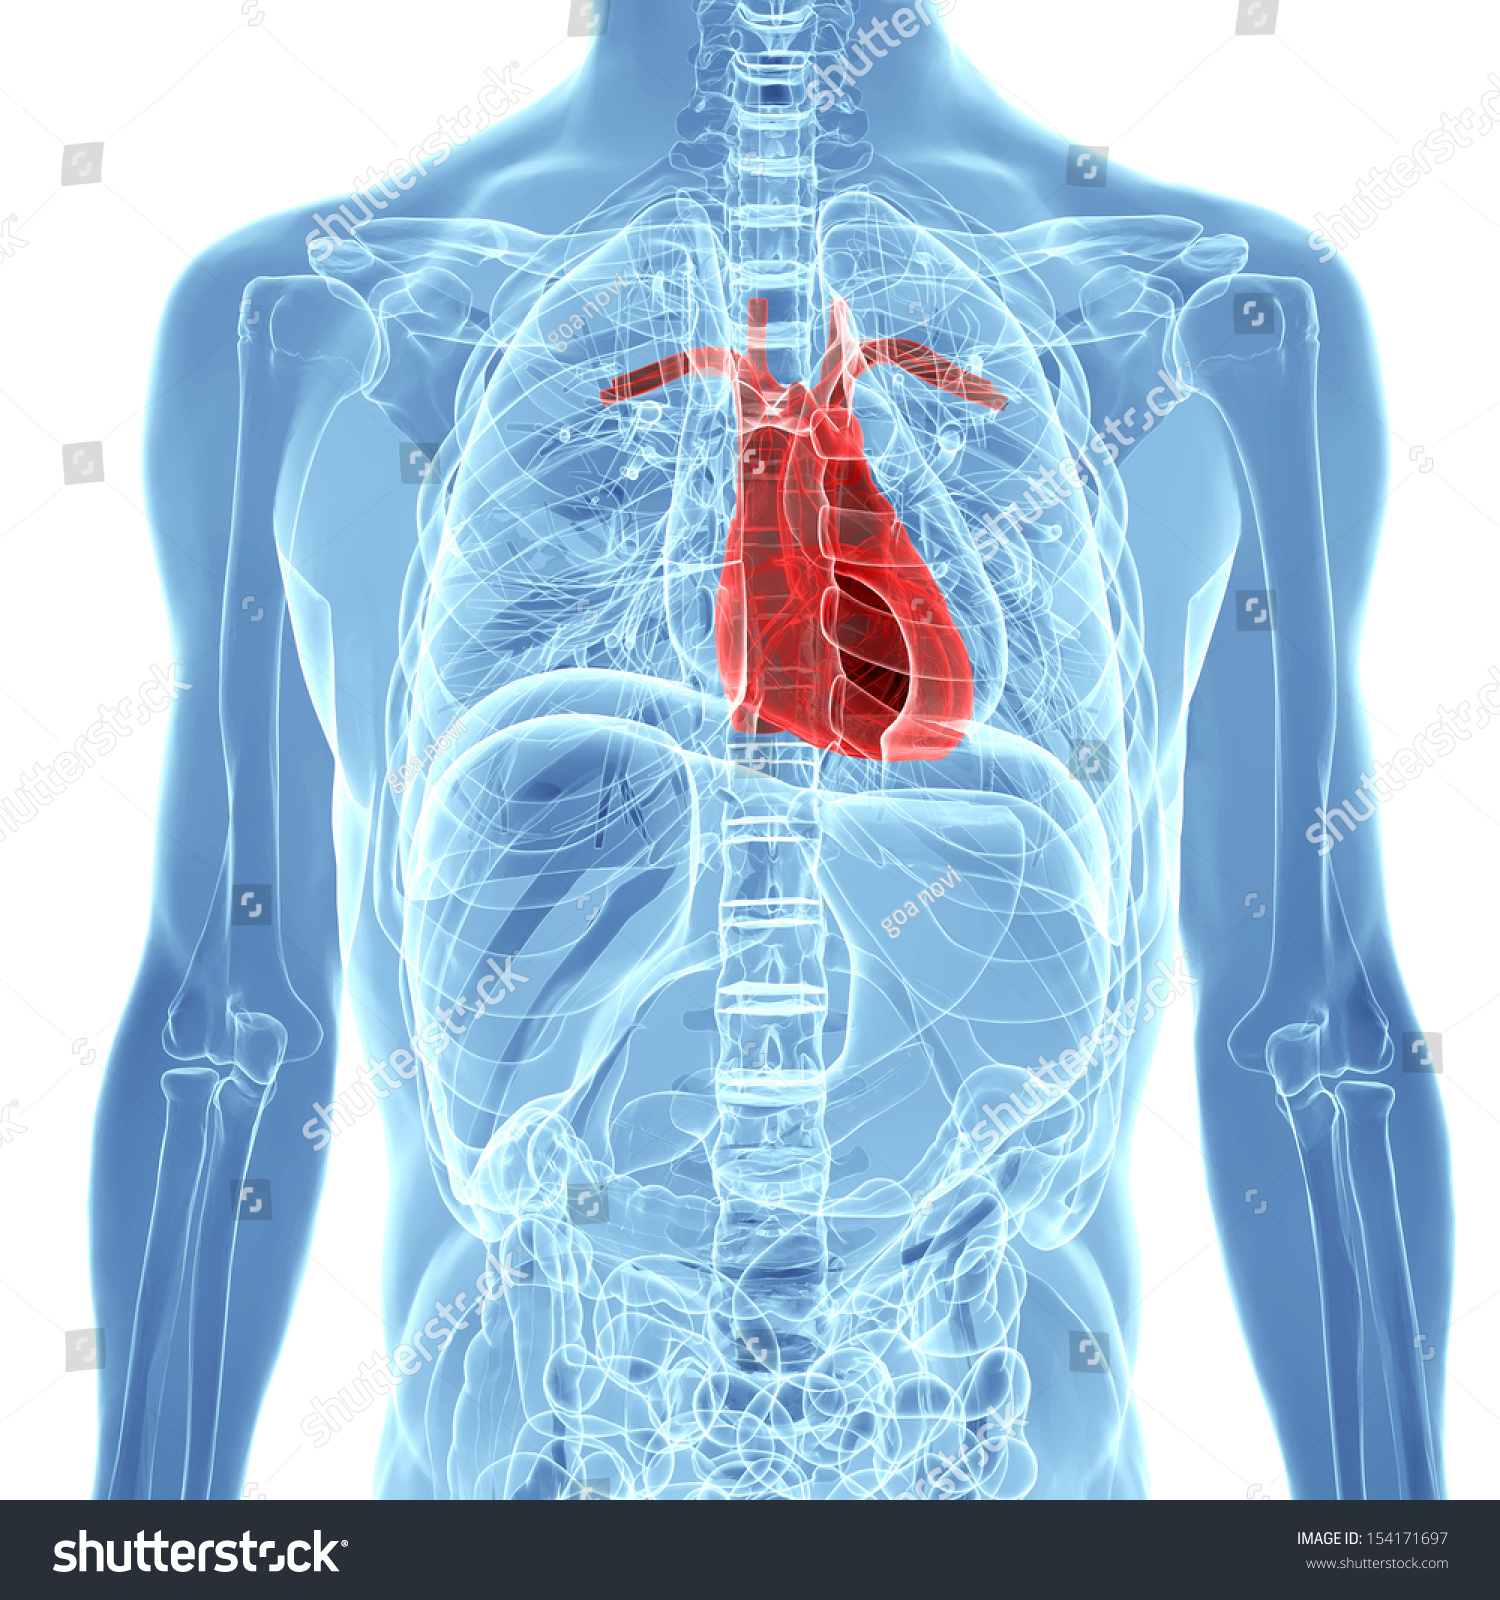 Human Heart Inside Human Xray Body Stock Illustration 154171697